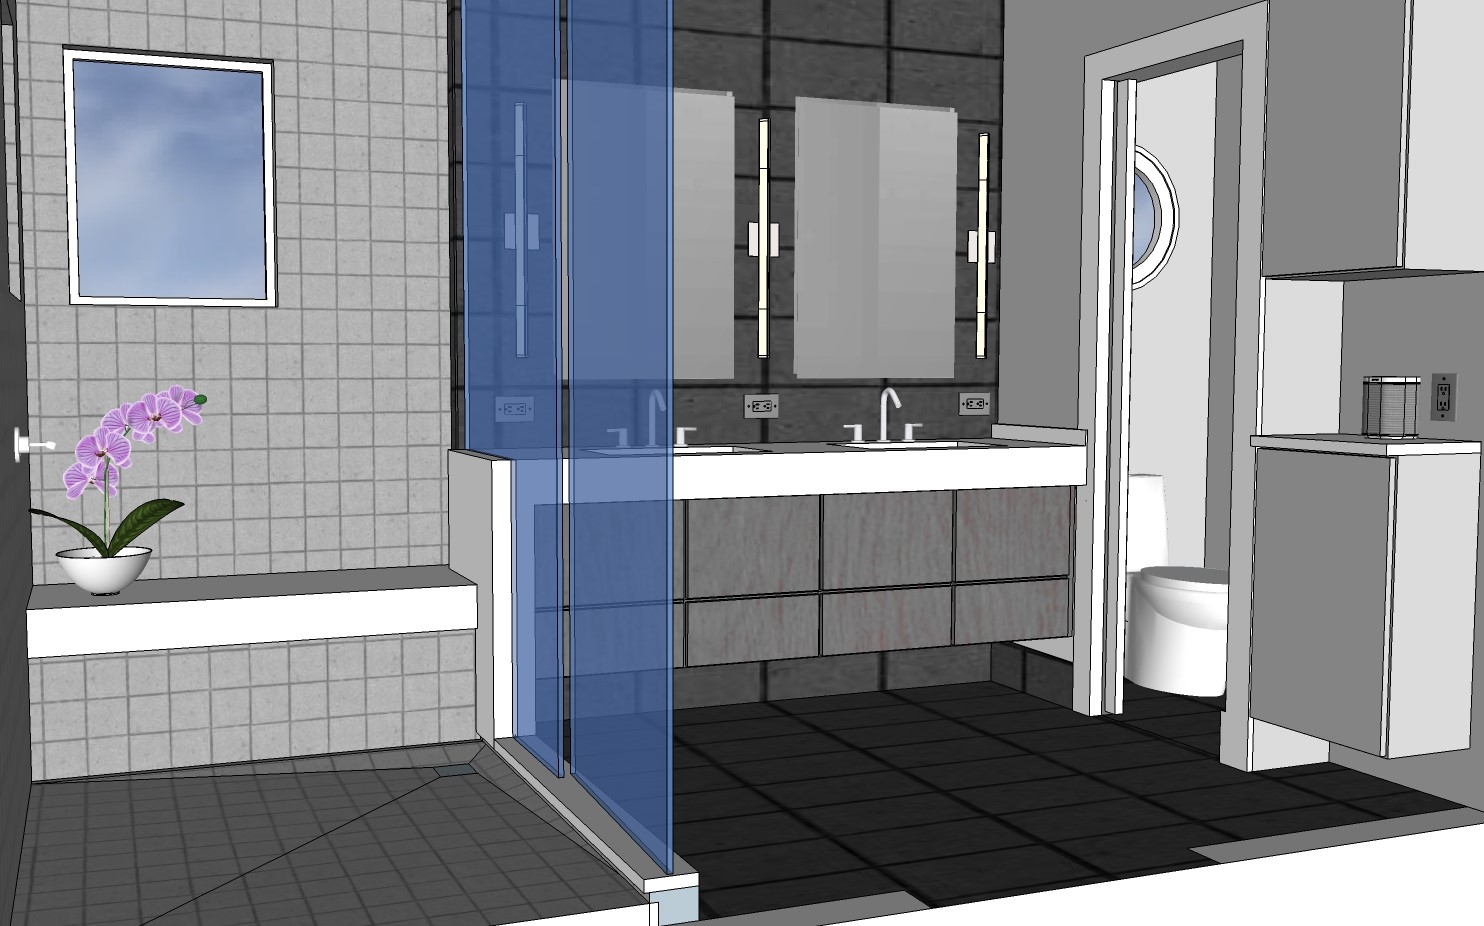 2016-01-10 designgene, DC modern, DC modern bath, modern bathroom, big shower remodel, waterfall counter, bathroom remodel,  (8).jpg